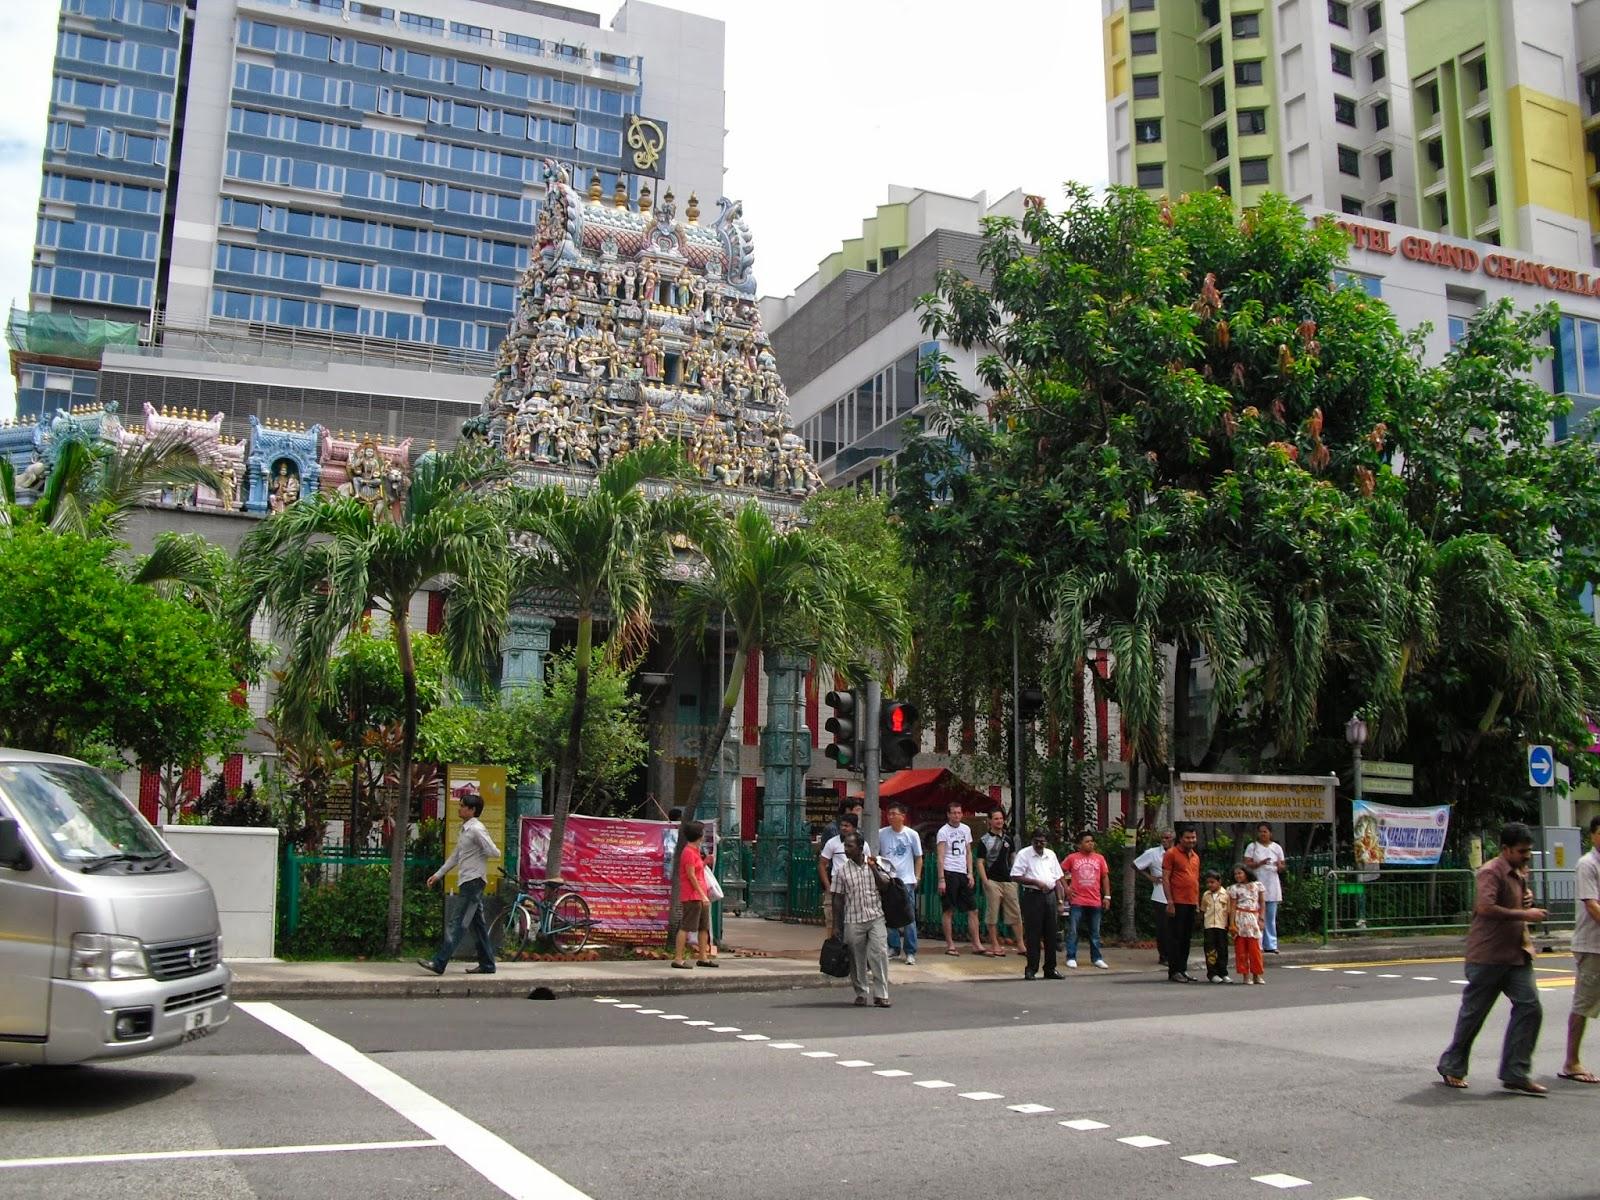 singapur, singapore barrio indio